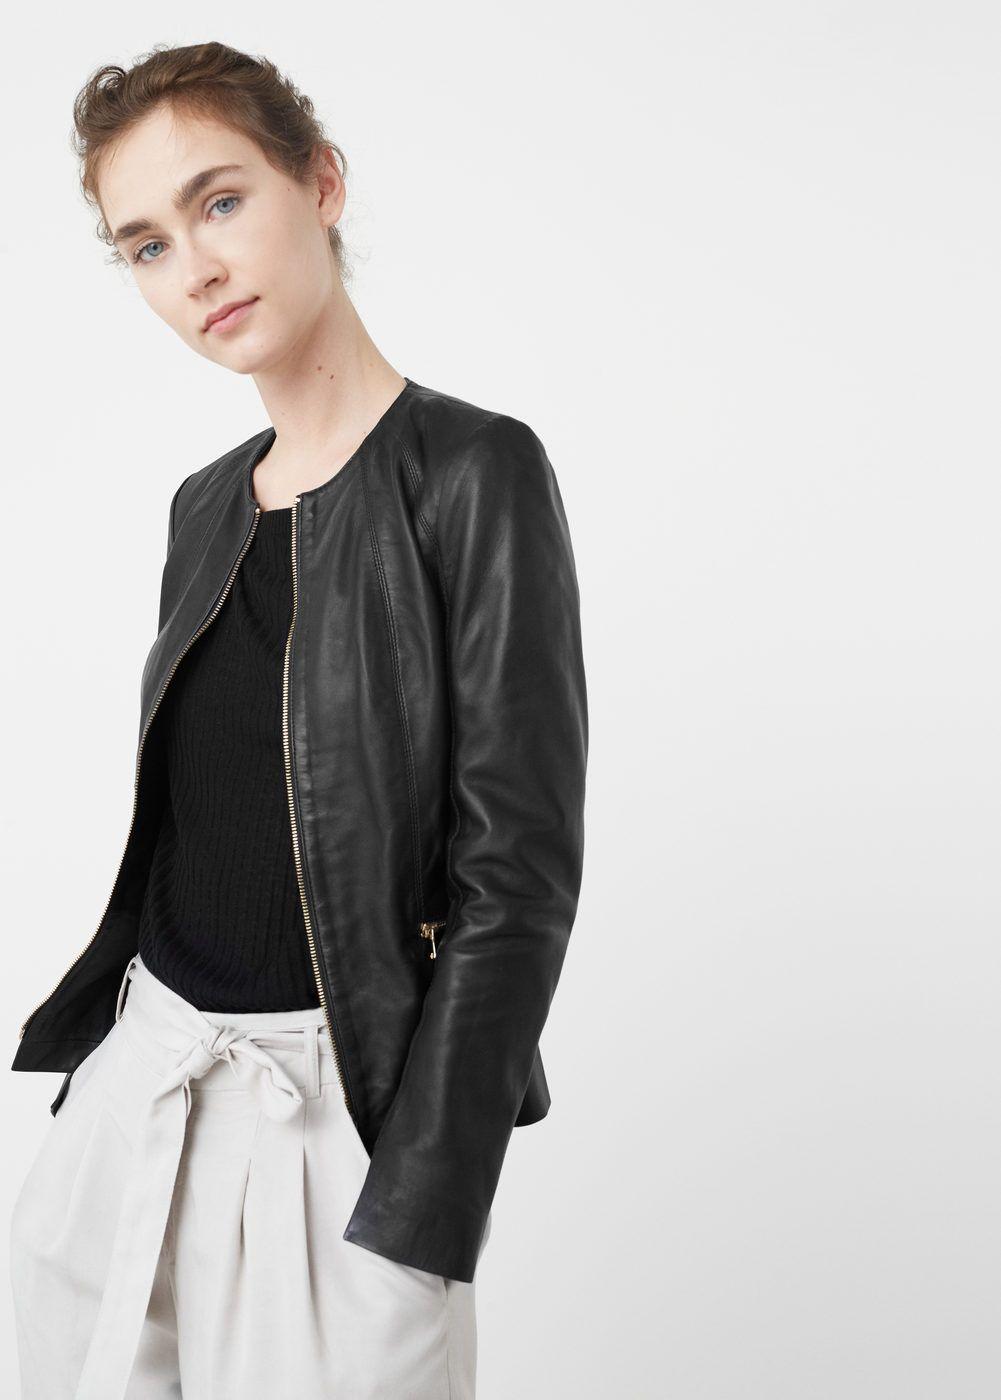 Zip Leather Jacket Women Mango Usa Zipped Leather Jacket Leather Jackets Women Work Outfits Women [ 1400 x 1001 Pixel ]